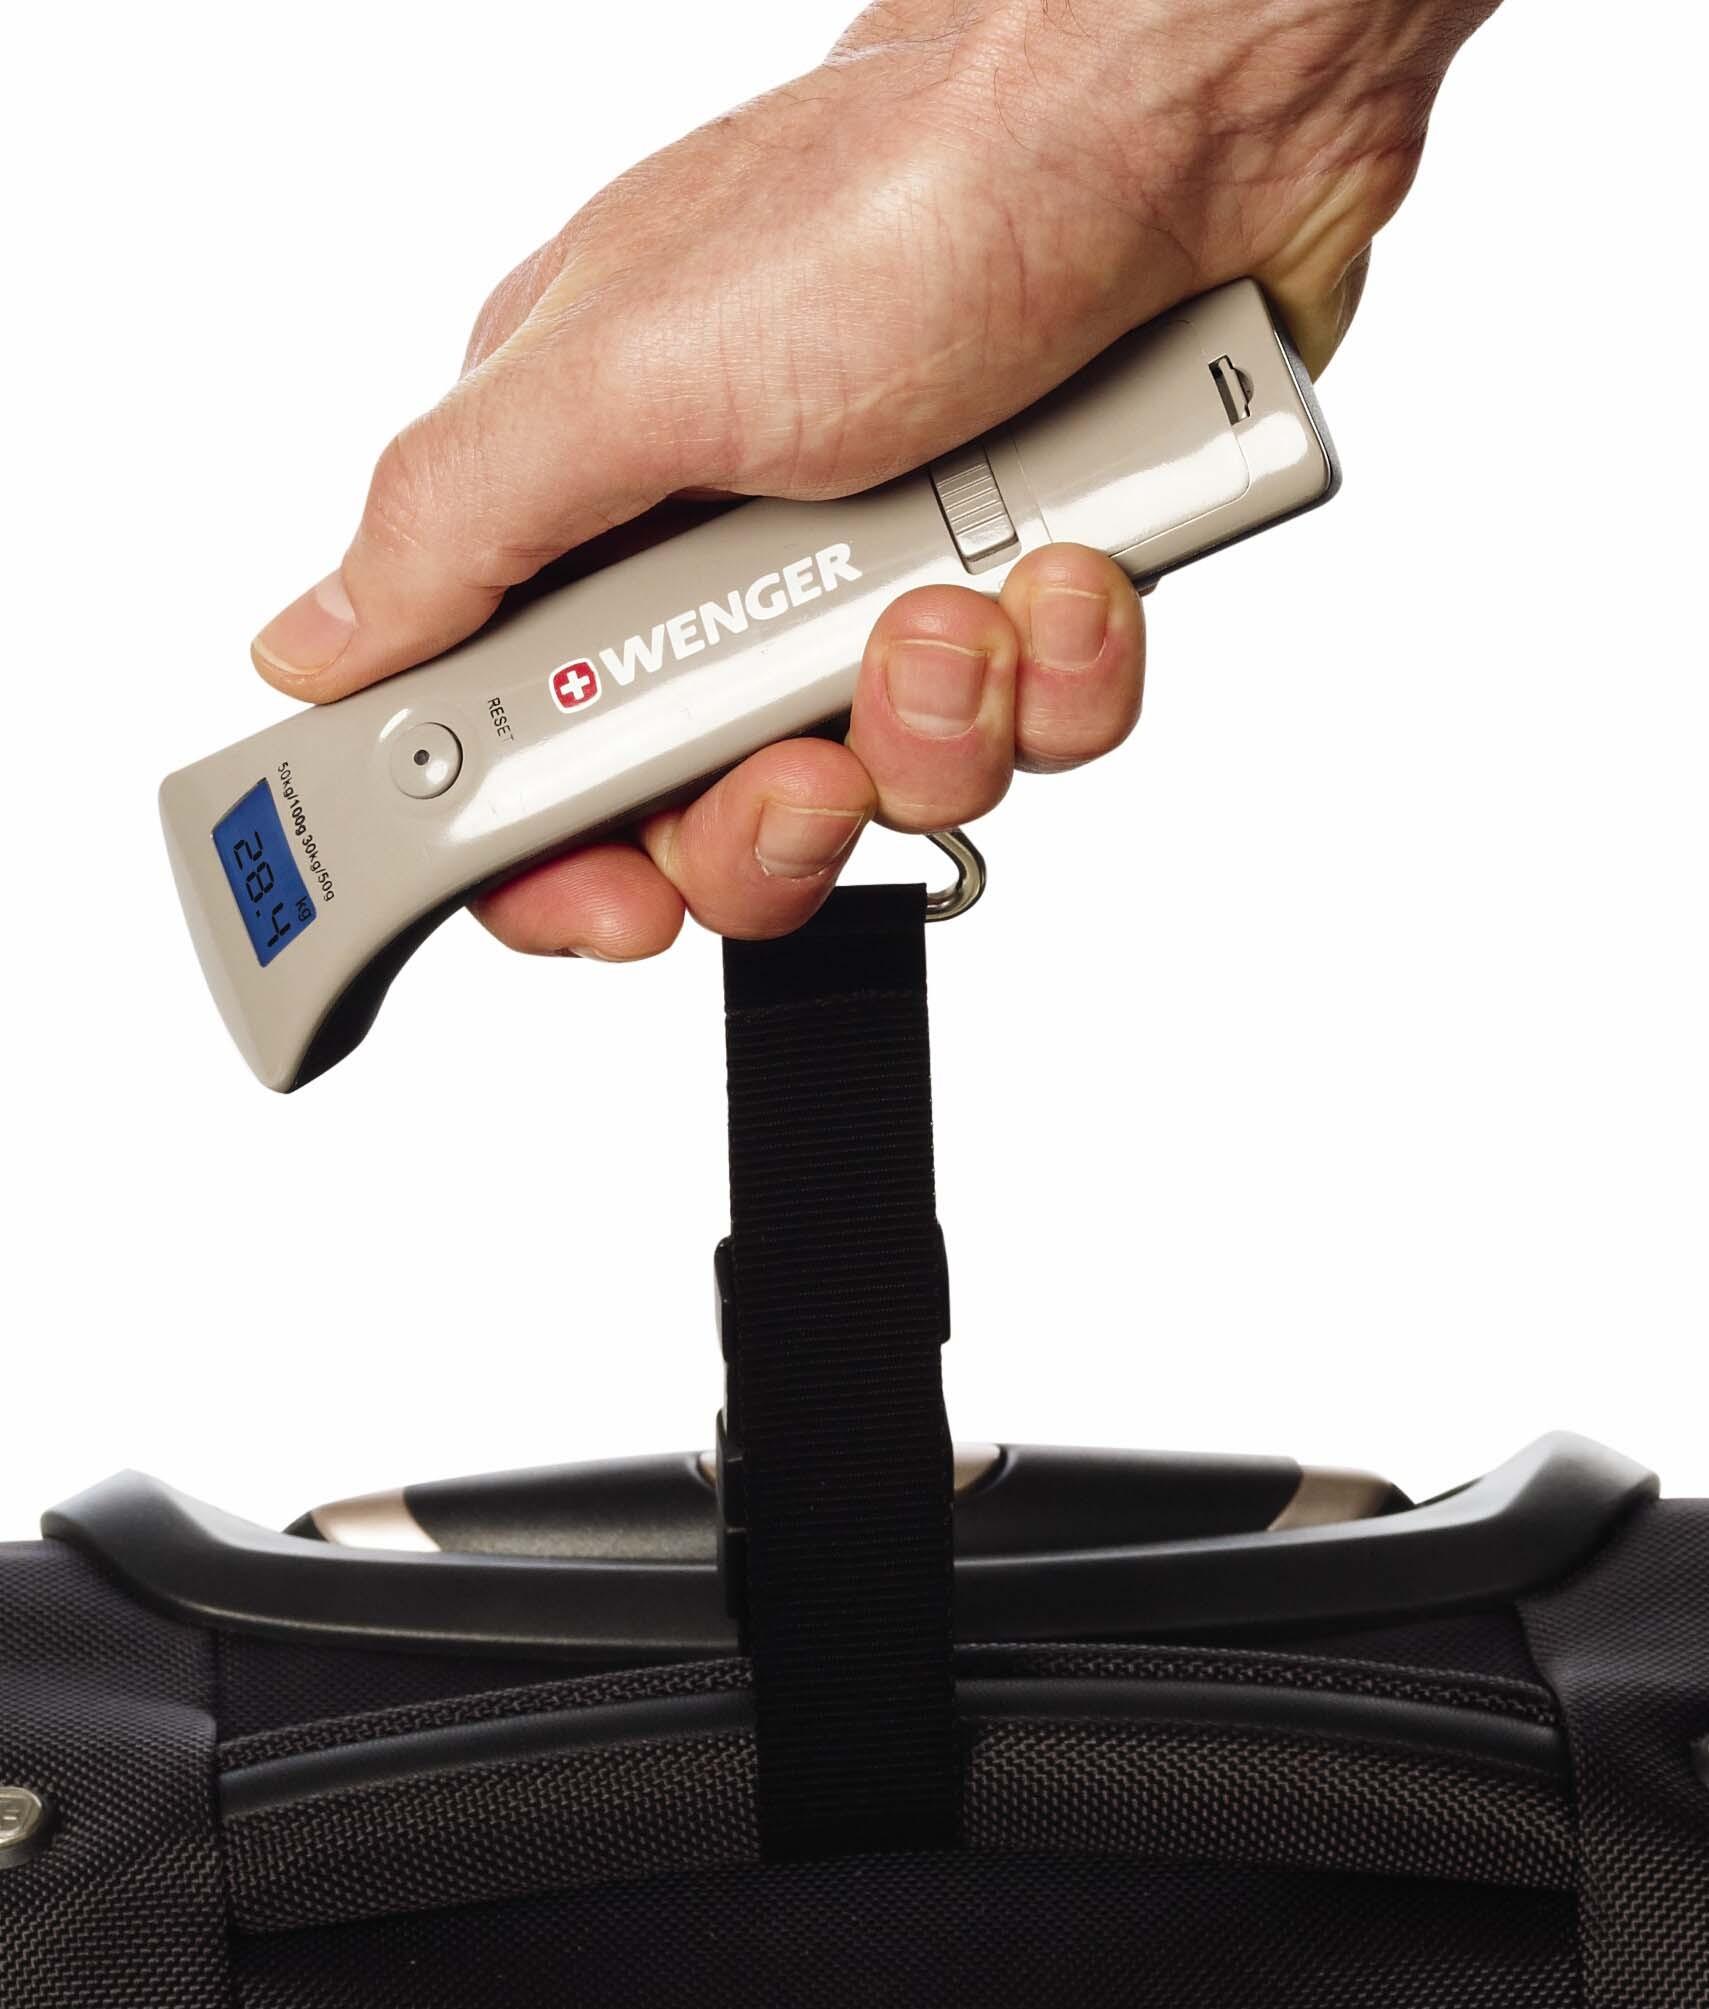 Wenger Digital Luggage Scale